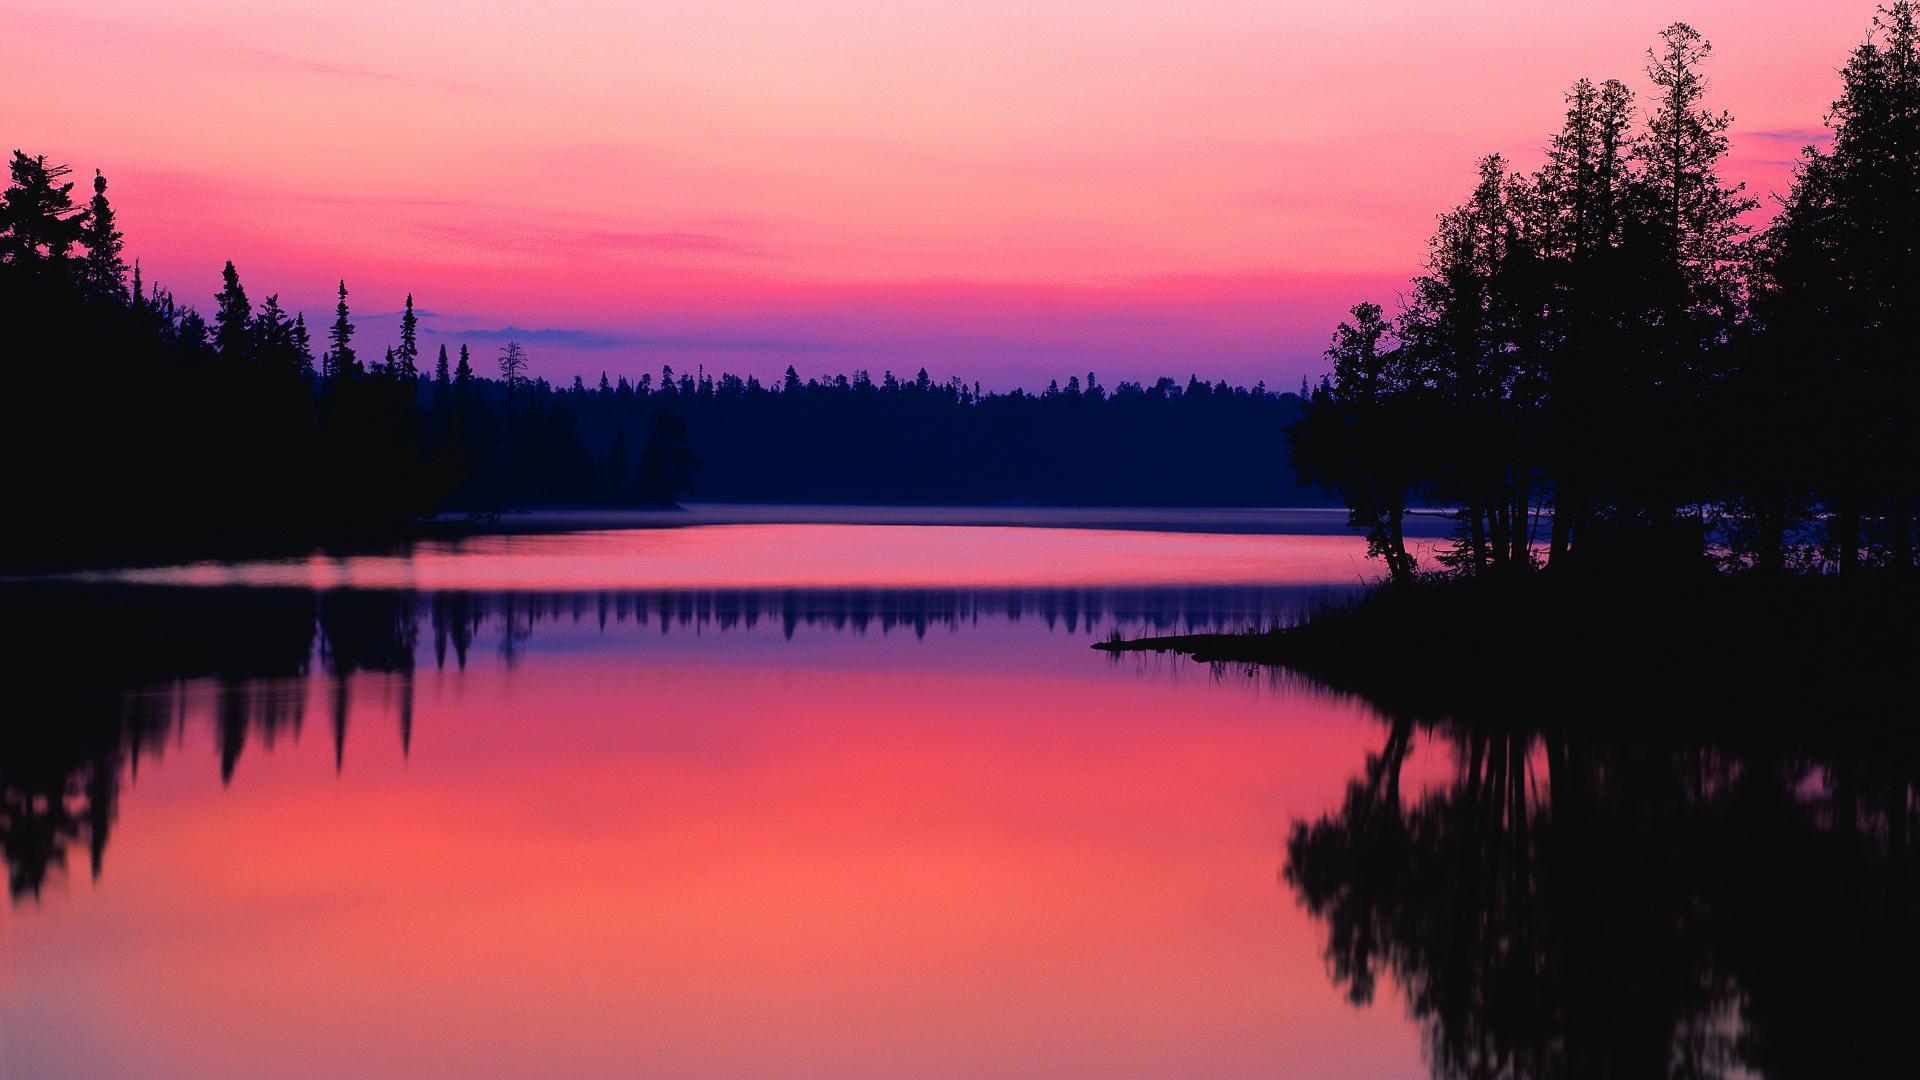 нежный закат над озером на телефон